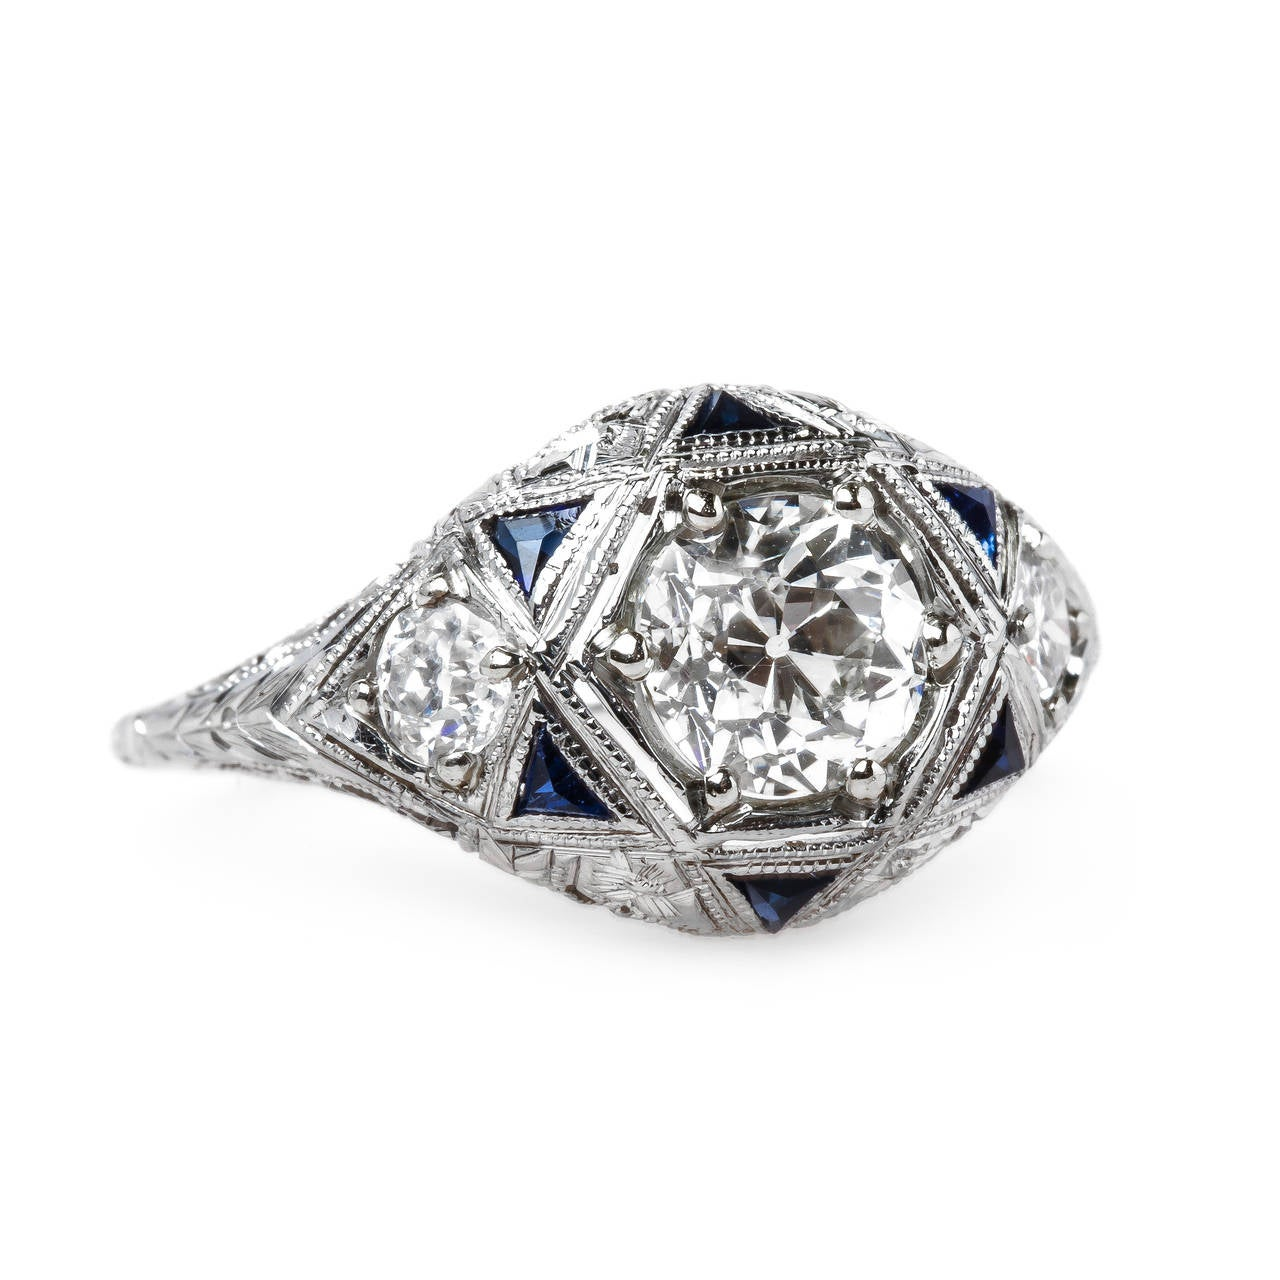 Intricate Art Deco 1 01 Carat Diamond Sapphire Gold Ring at 1stdibs